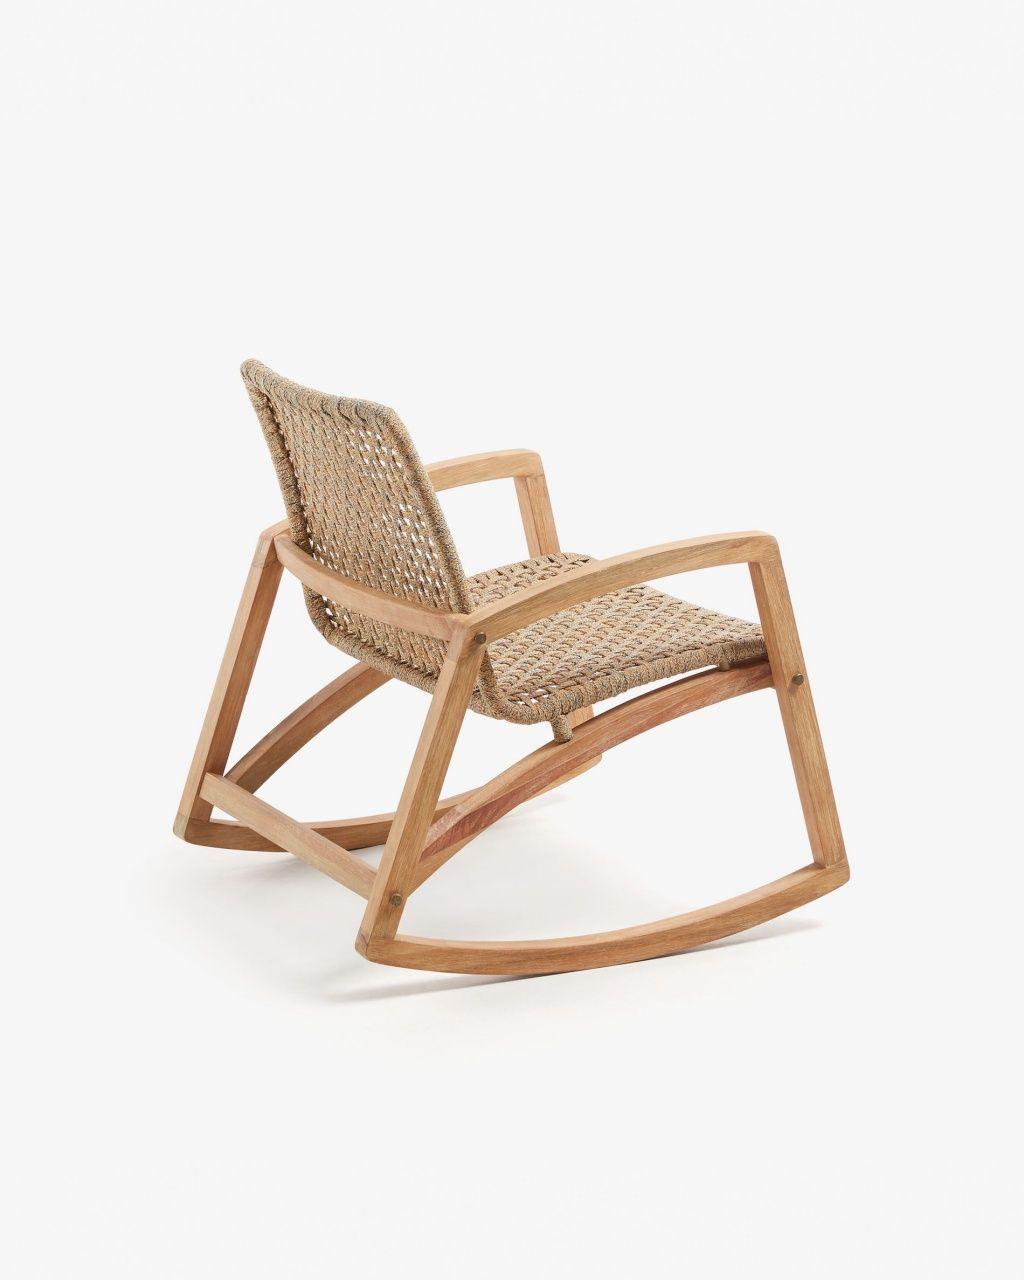 Vintage Front Porch Rocking Chairs Modern Rocking Chair Wooden Rocking Chairs Rocking Chairs For Sale